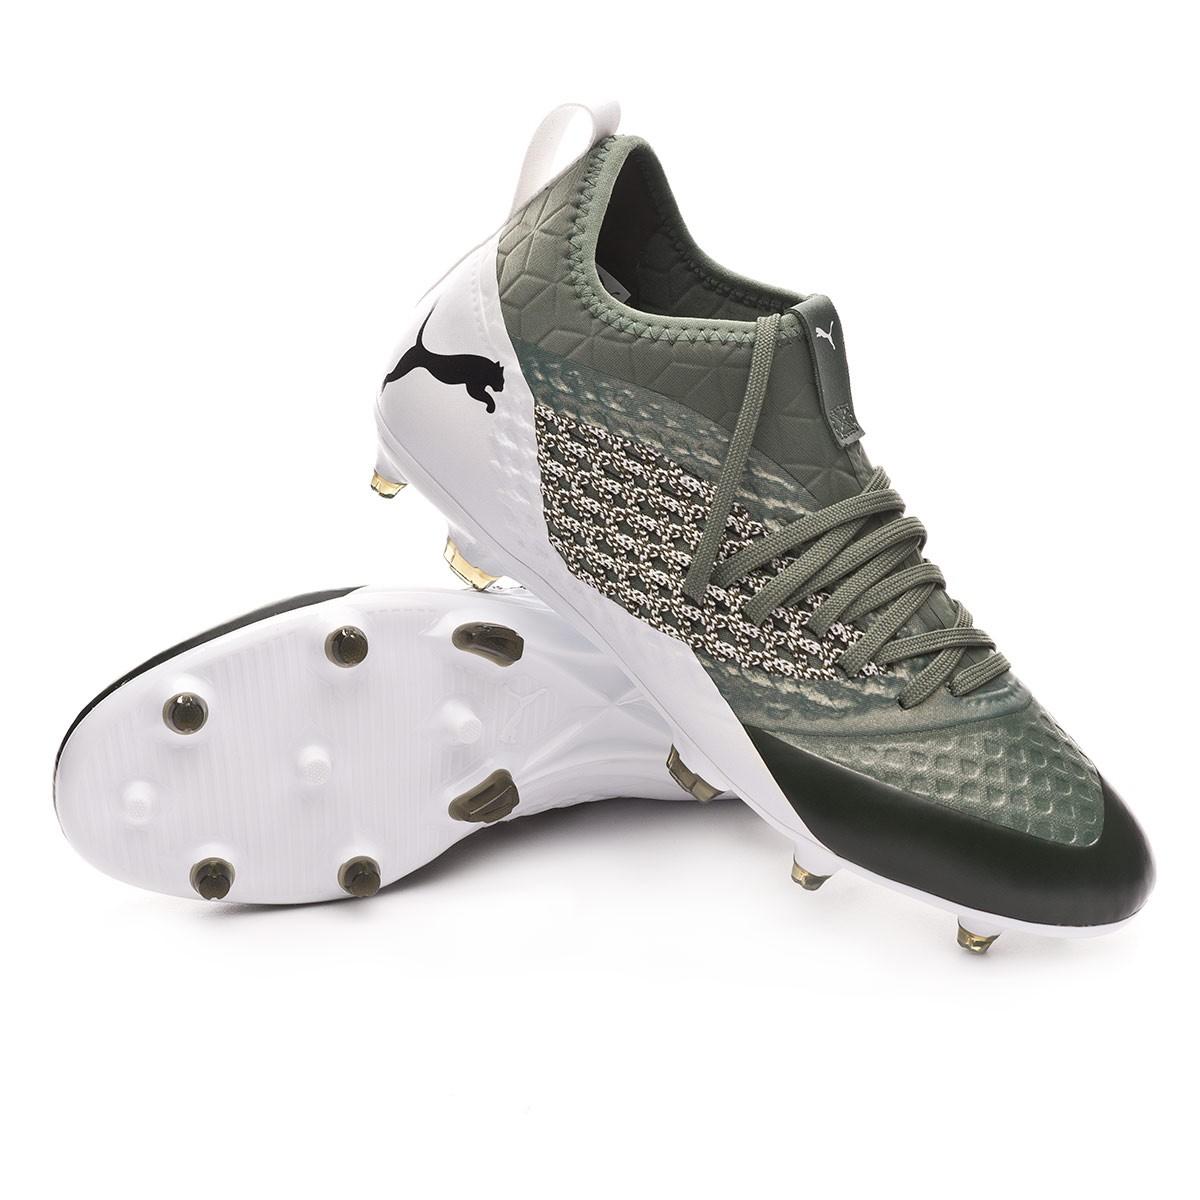 5ca0fe8dc0d38 Zapatos de fútbol Puma Future 2.3 Netfit FG AG Verde-Blanco - Tienda de  fútbol Fútbol Emotion